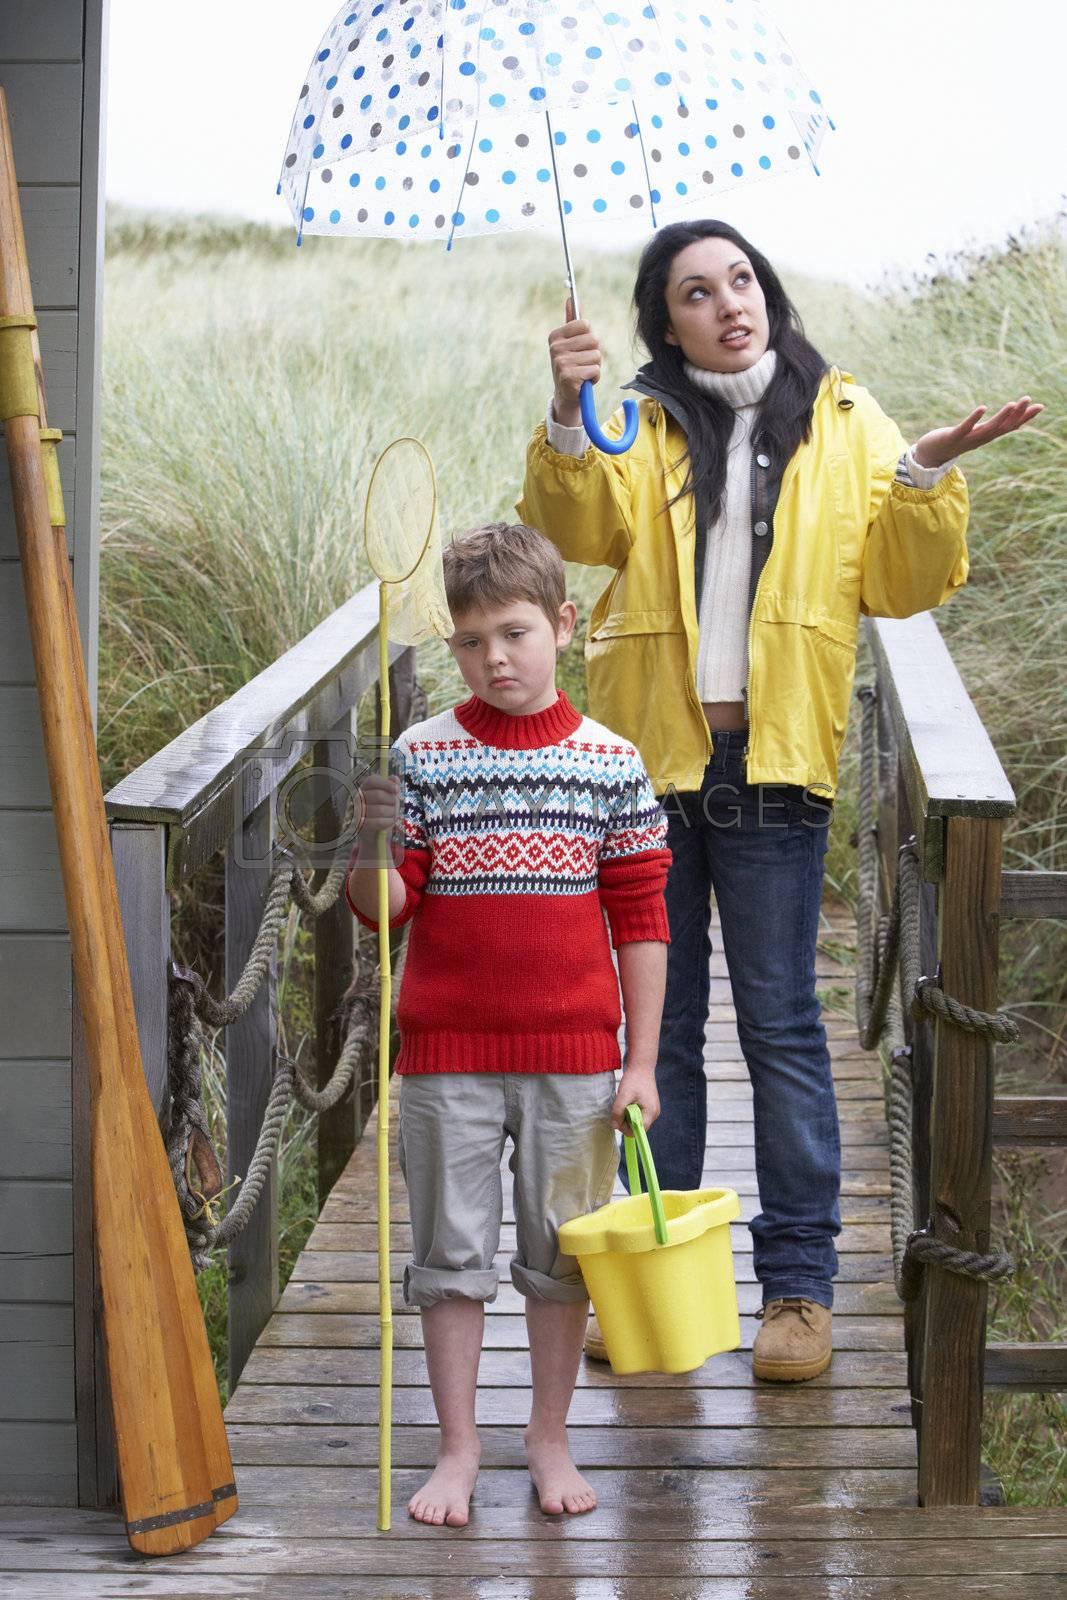 Sad woman and child with umbrella